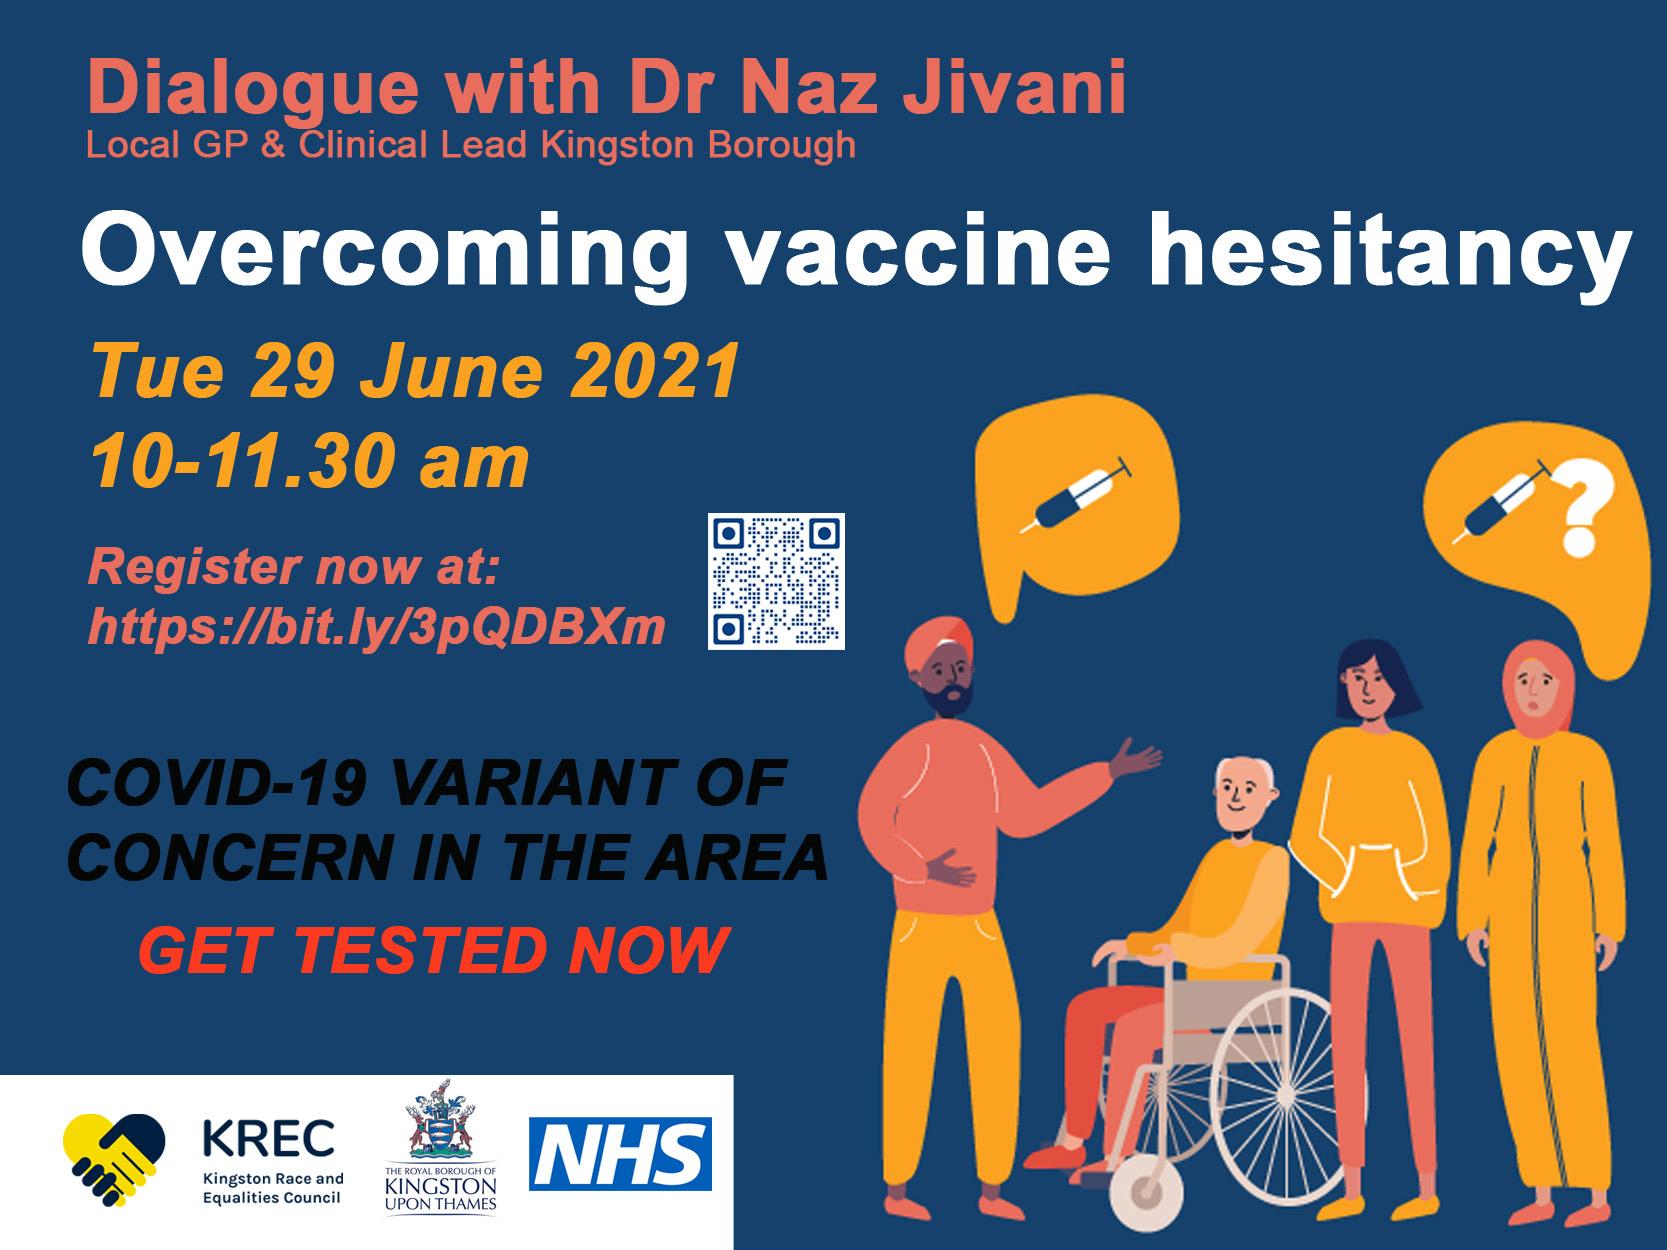 Lets talk about vaccine hesitancy